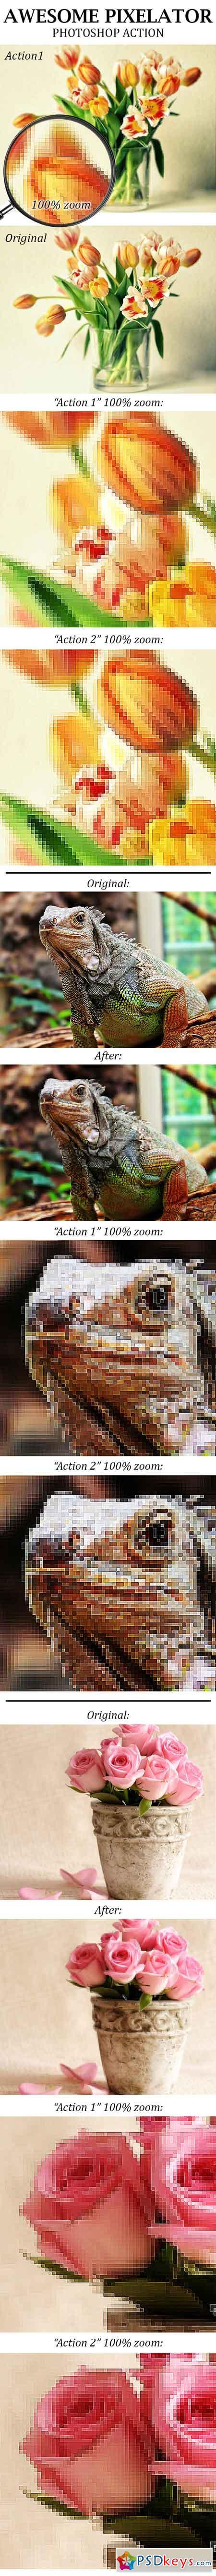 Pixelator » Free Download Photoshop Vector Stock image Via